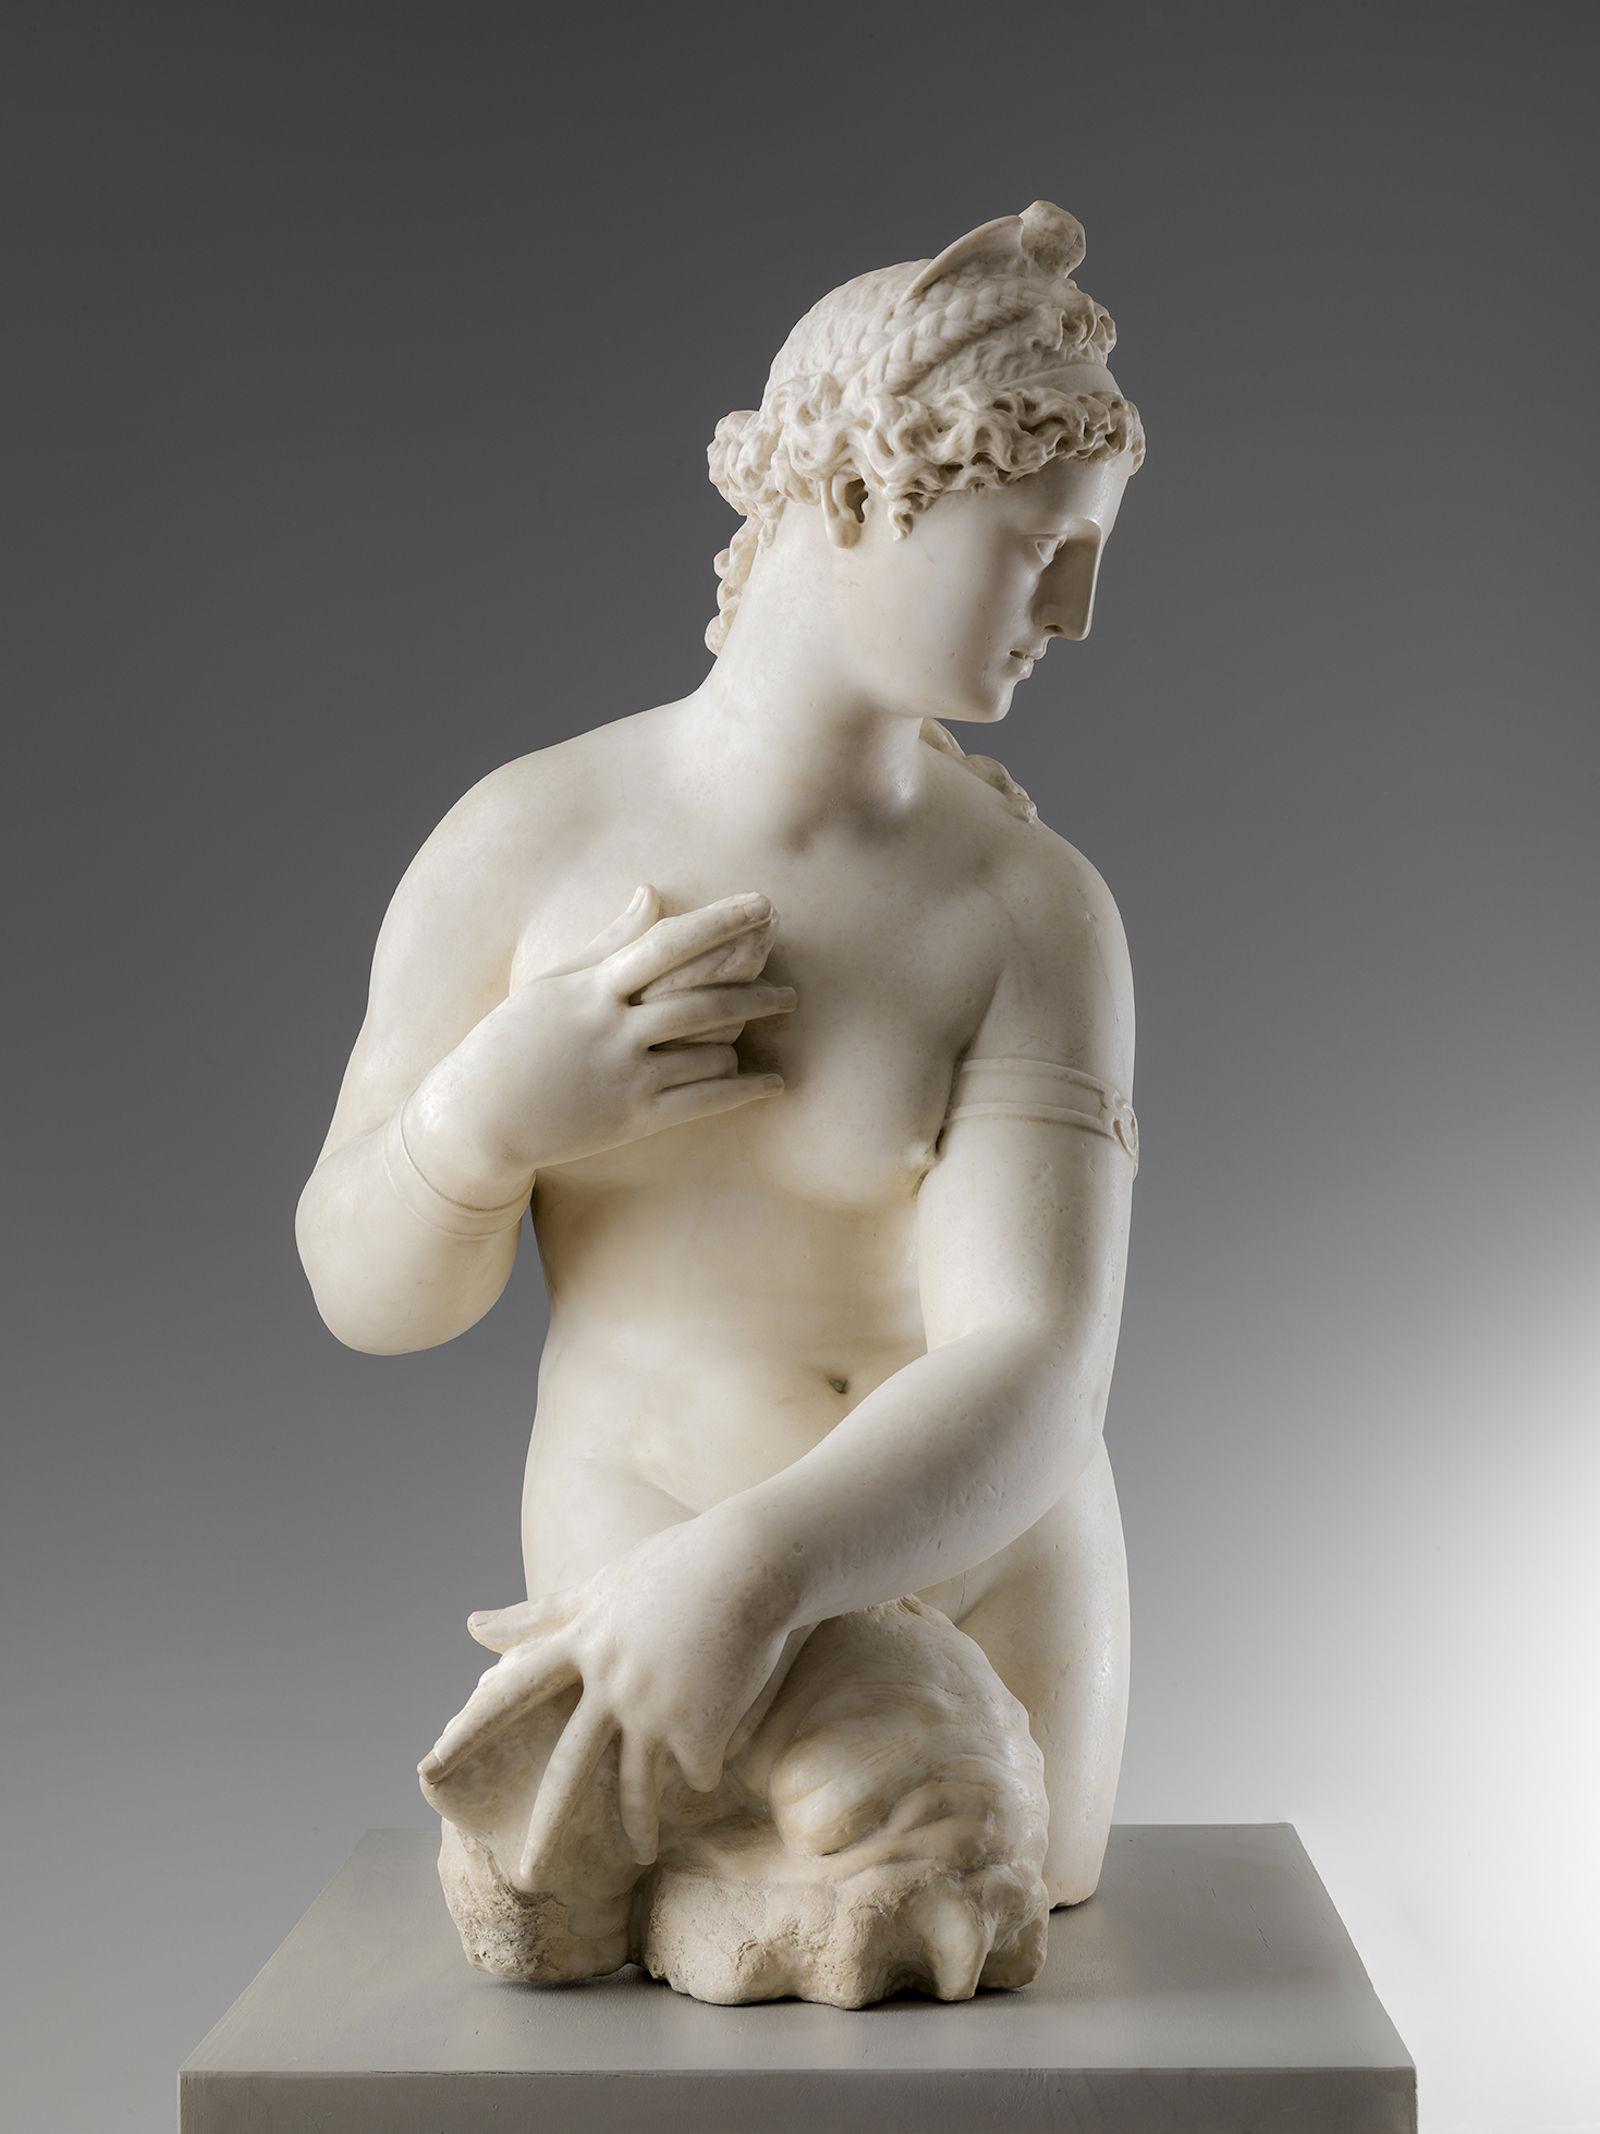 Bagno a Ripoli - La leggenda della Fata Morgana - Toscana Ovunque Bella